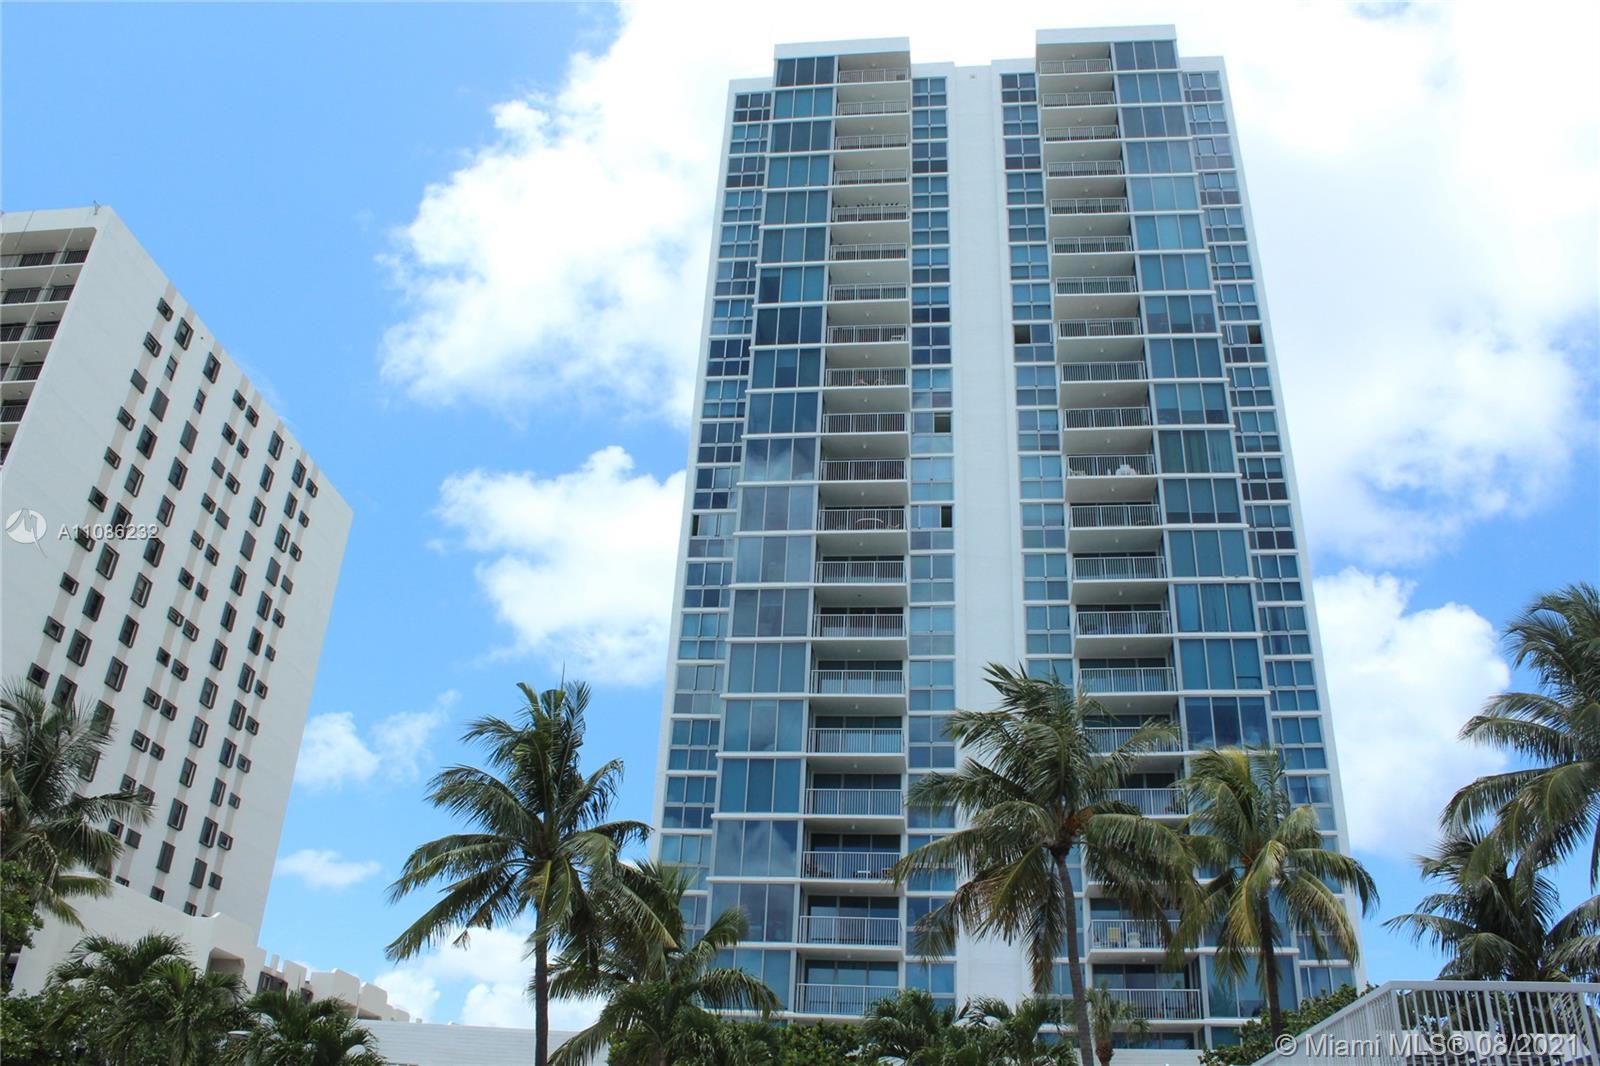 Mirasol Ocean Towers #504 - 2655 Collins Ave #504, Miami Beach, FL 33140